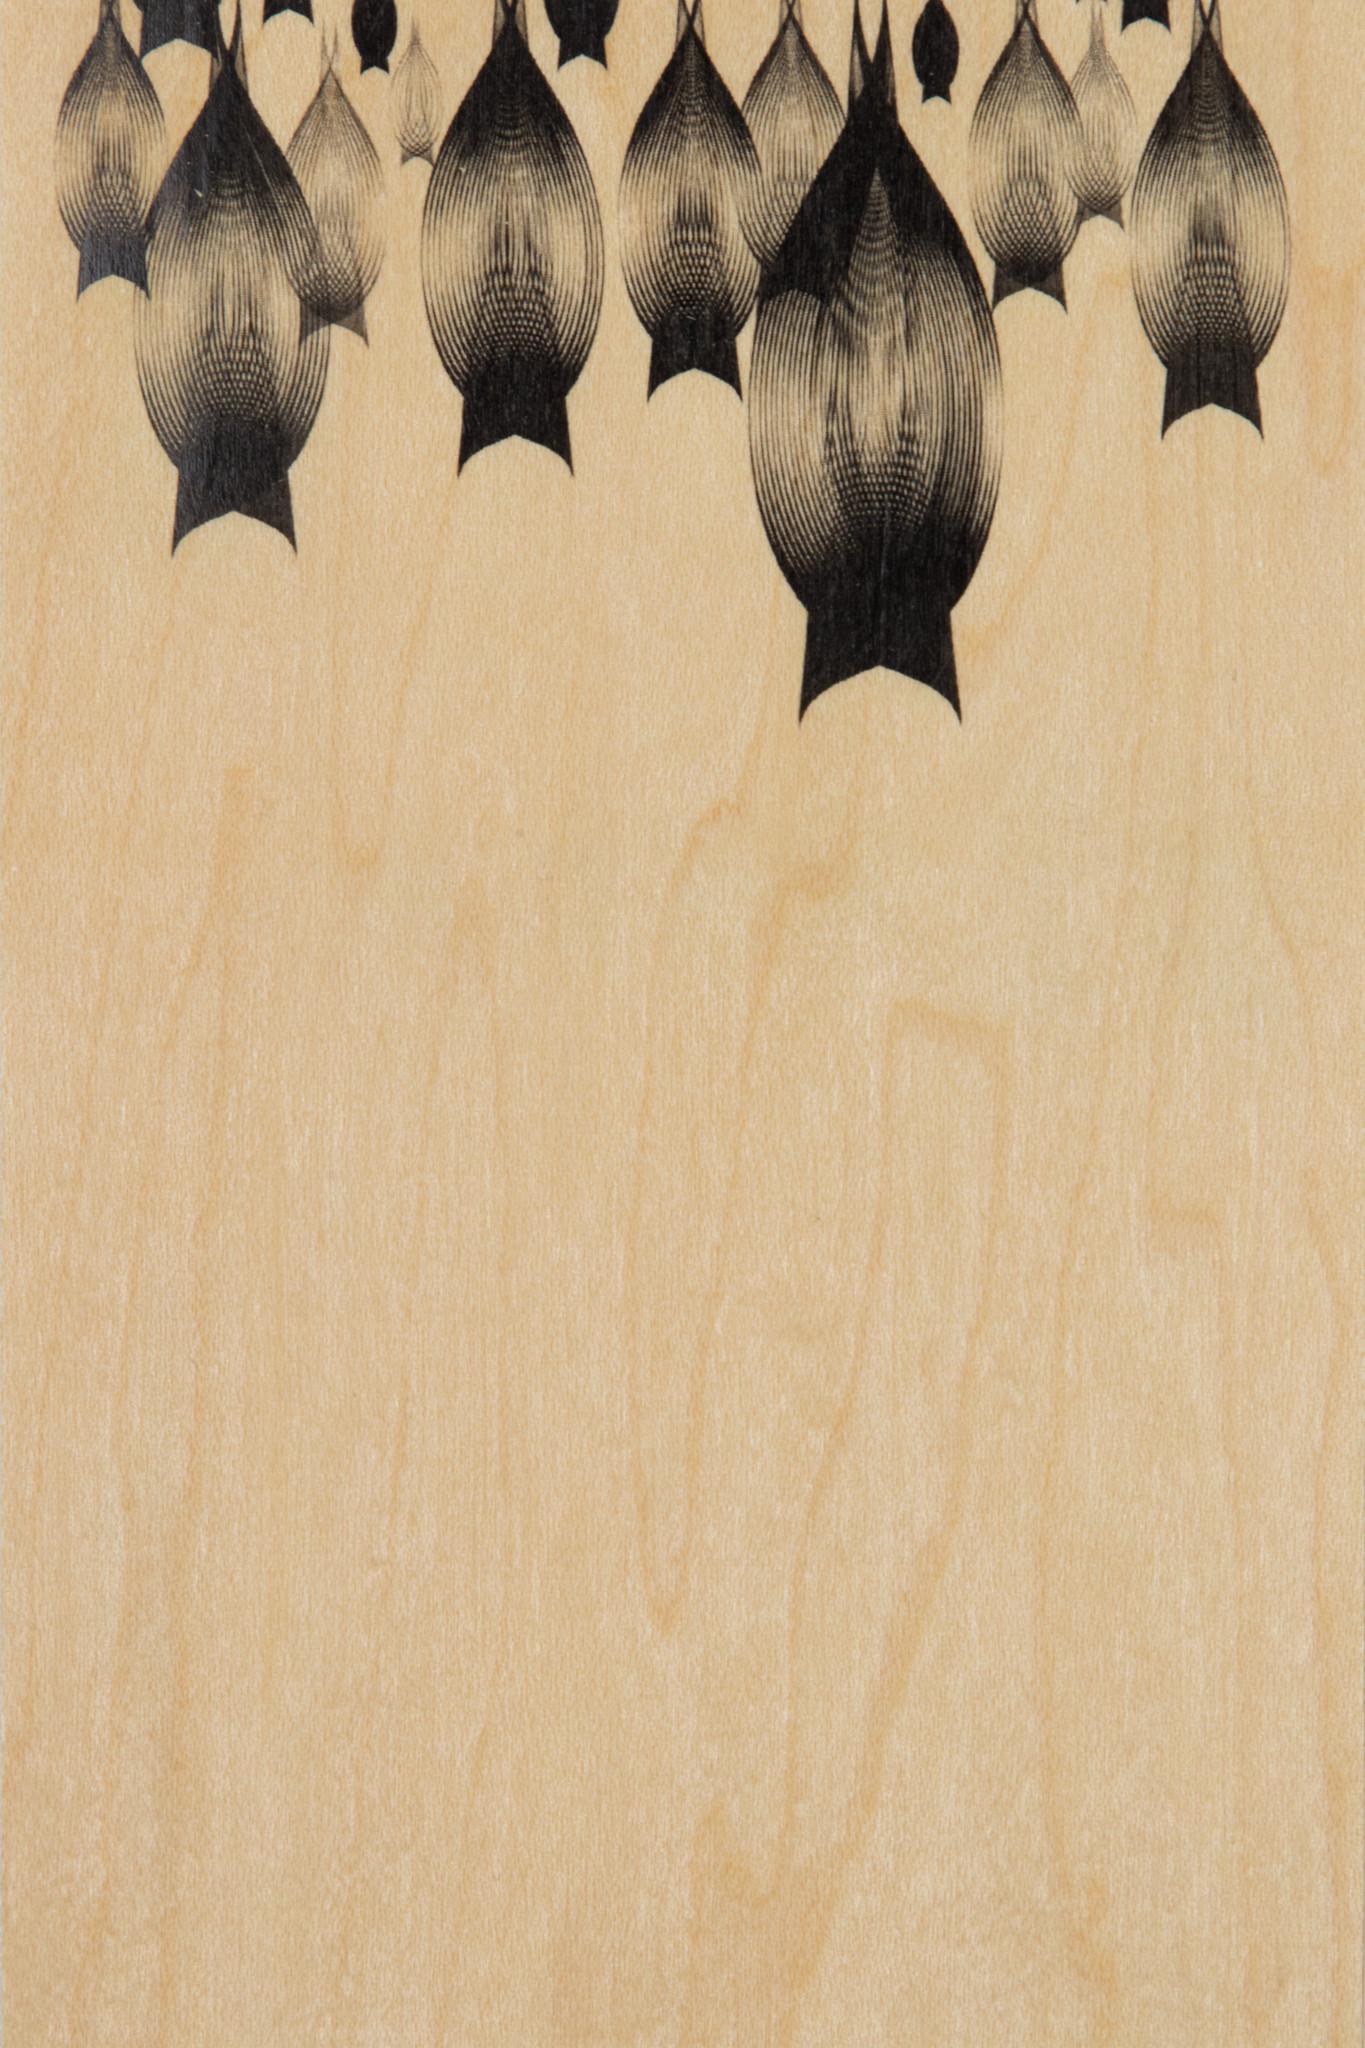 WOODHI postcard made of wood - Bats